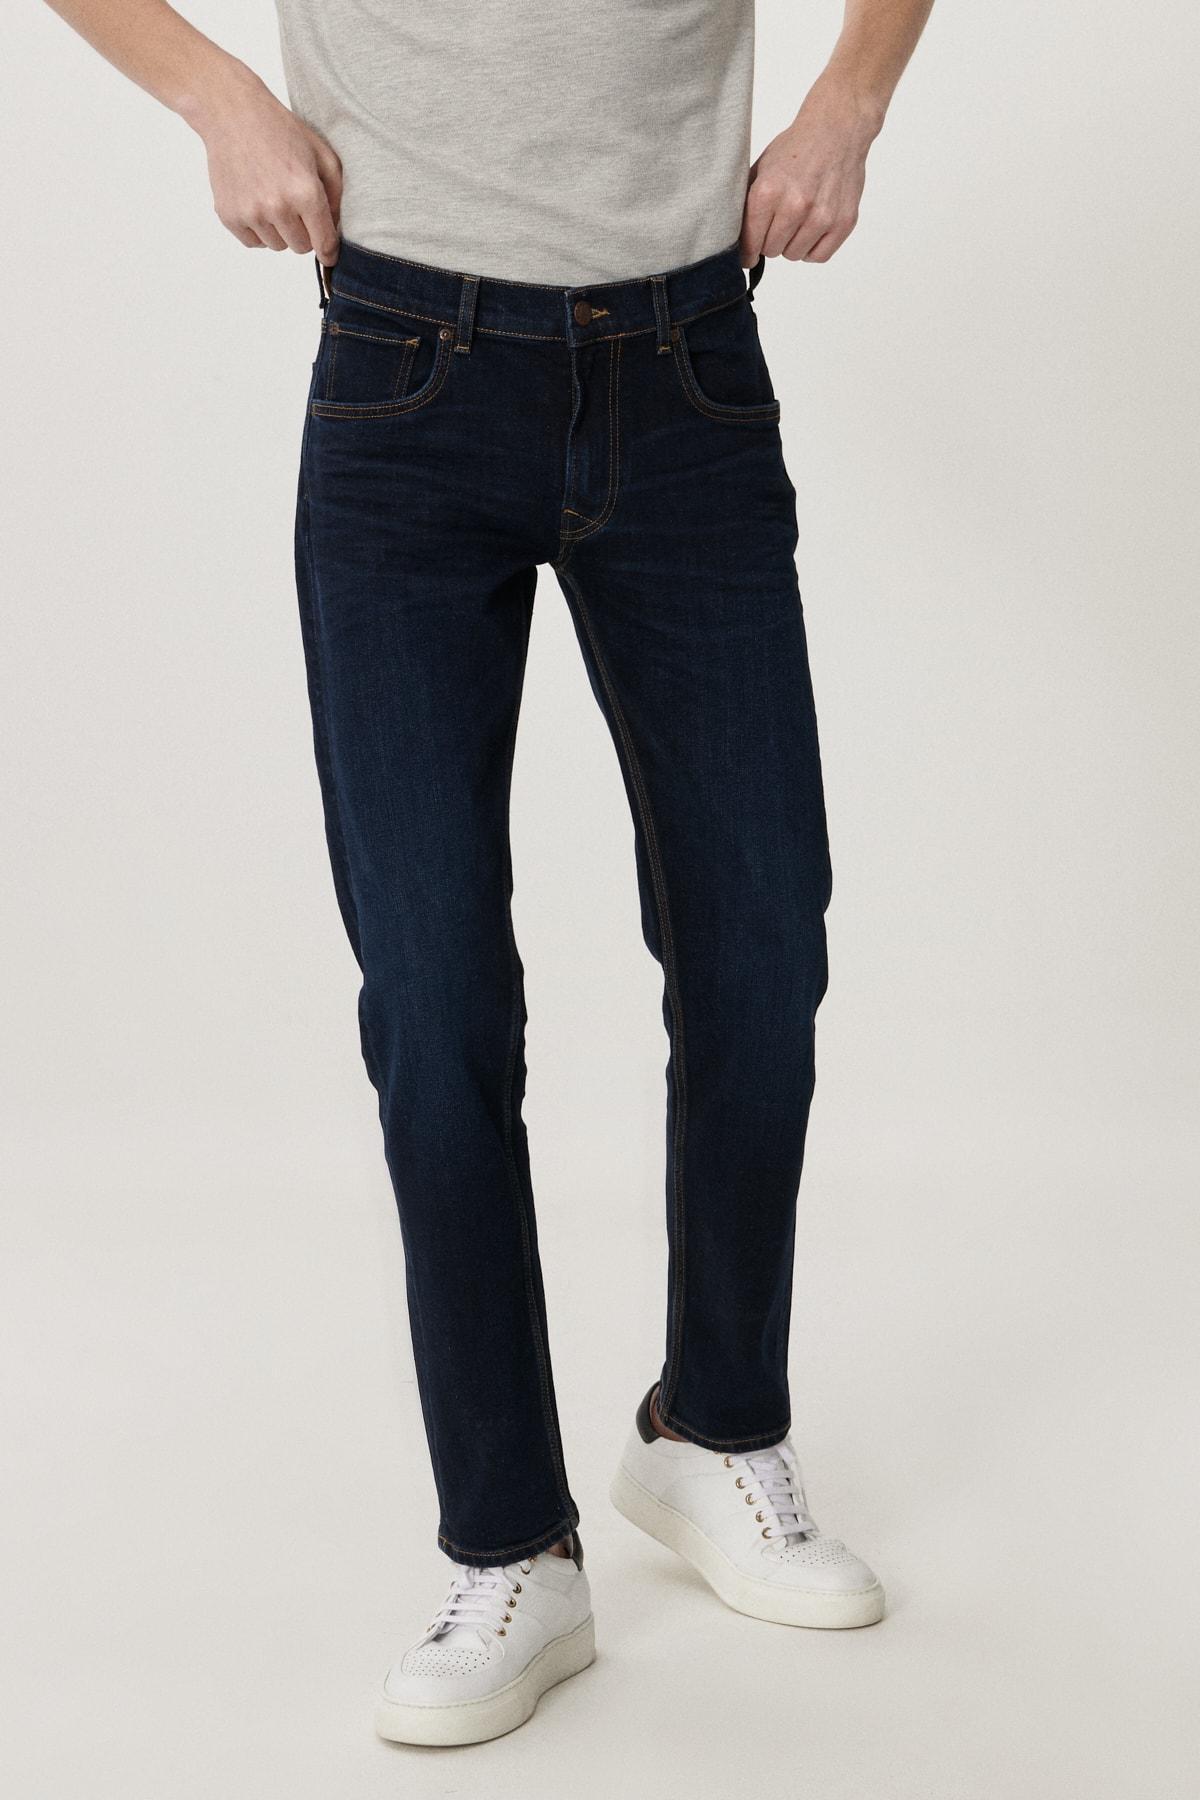 Lee Daren Erkek Koyu Mavi Straight Fit Normal Bel Düz Paça Esnek Jean Pantolon